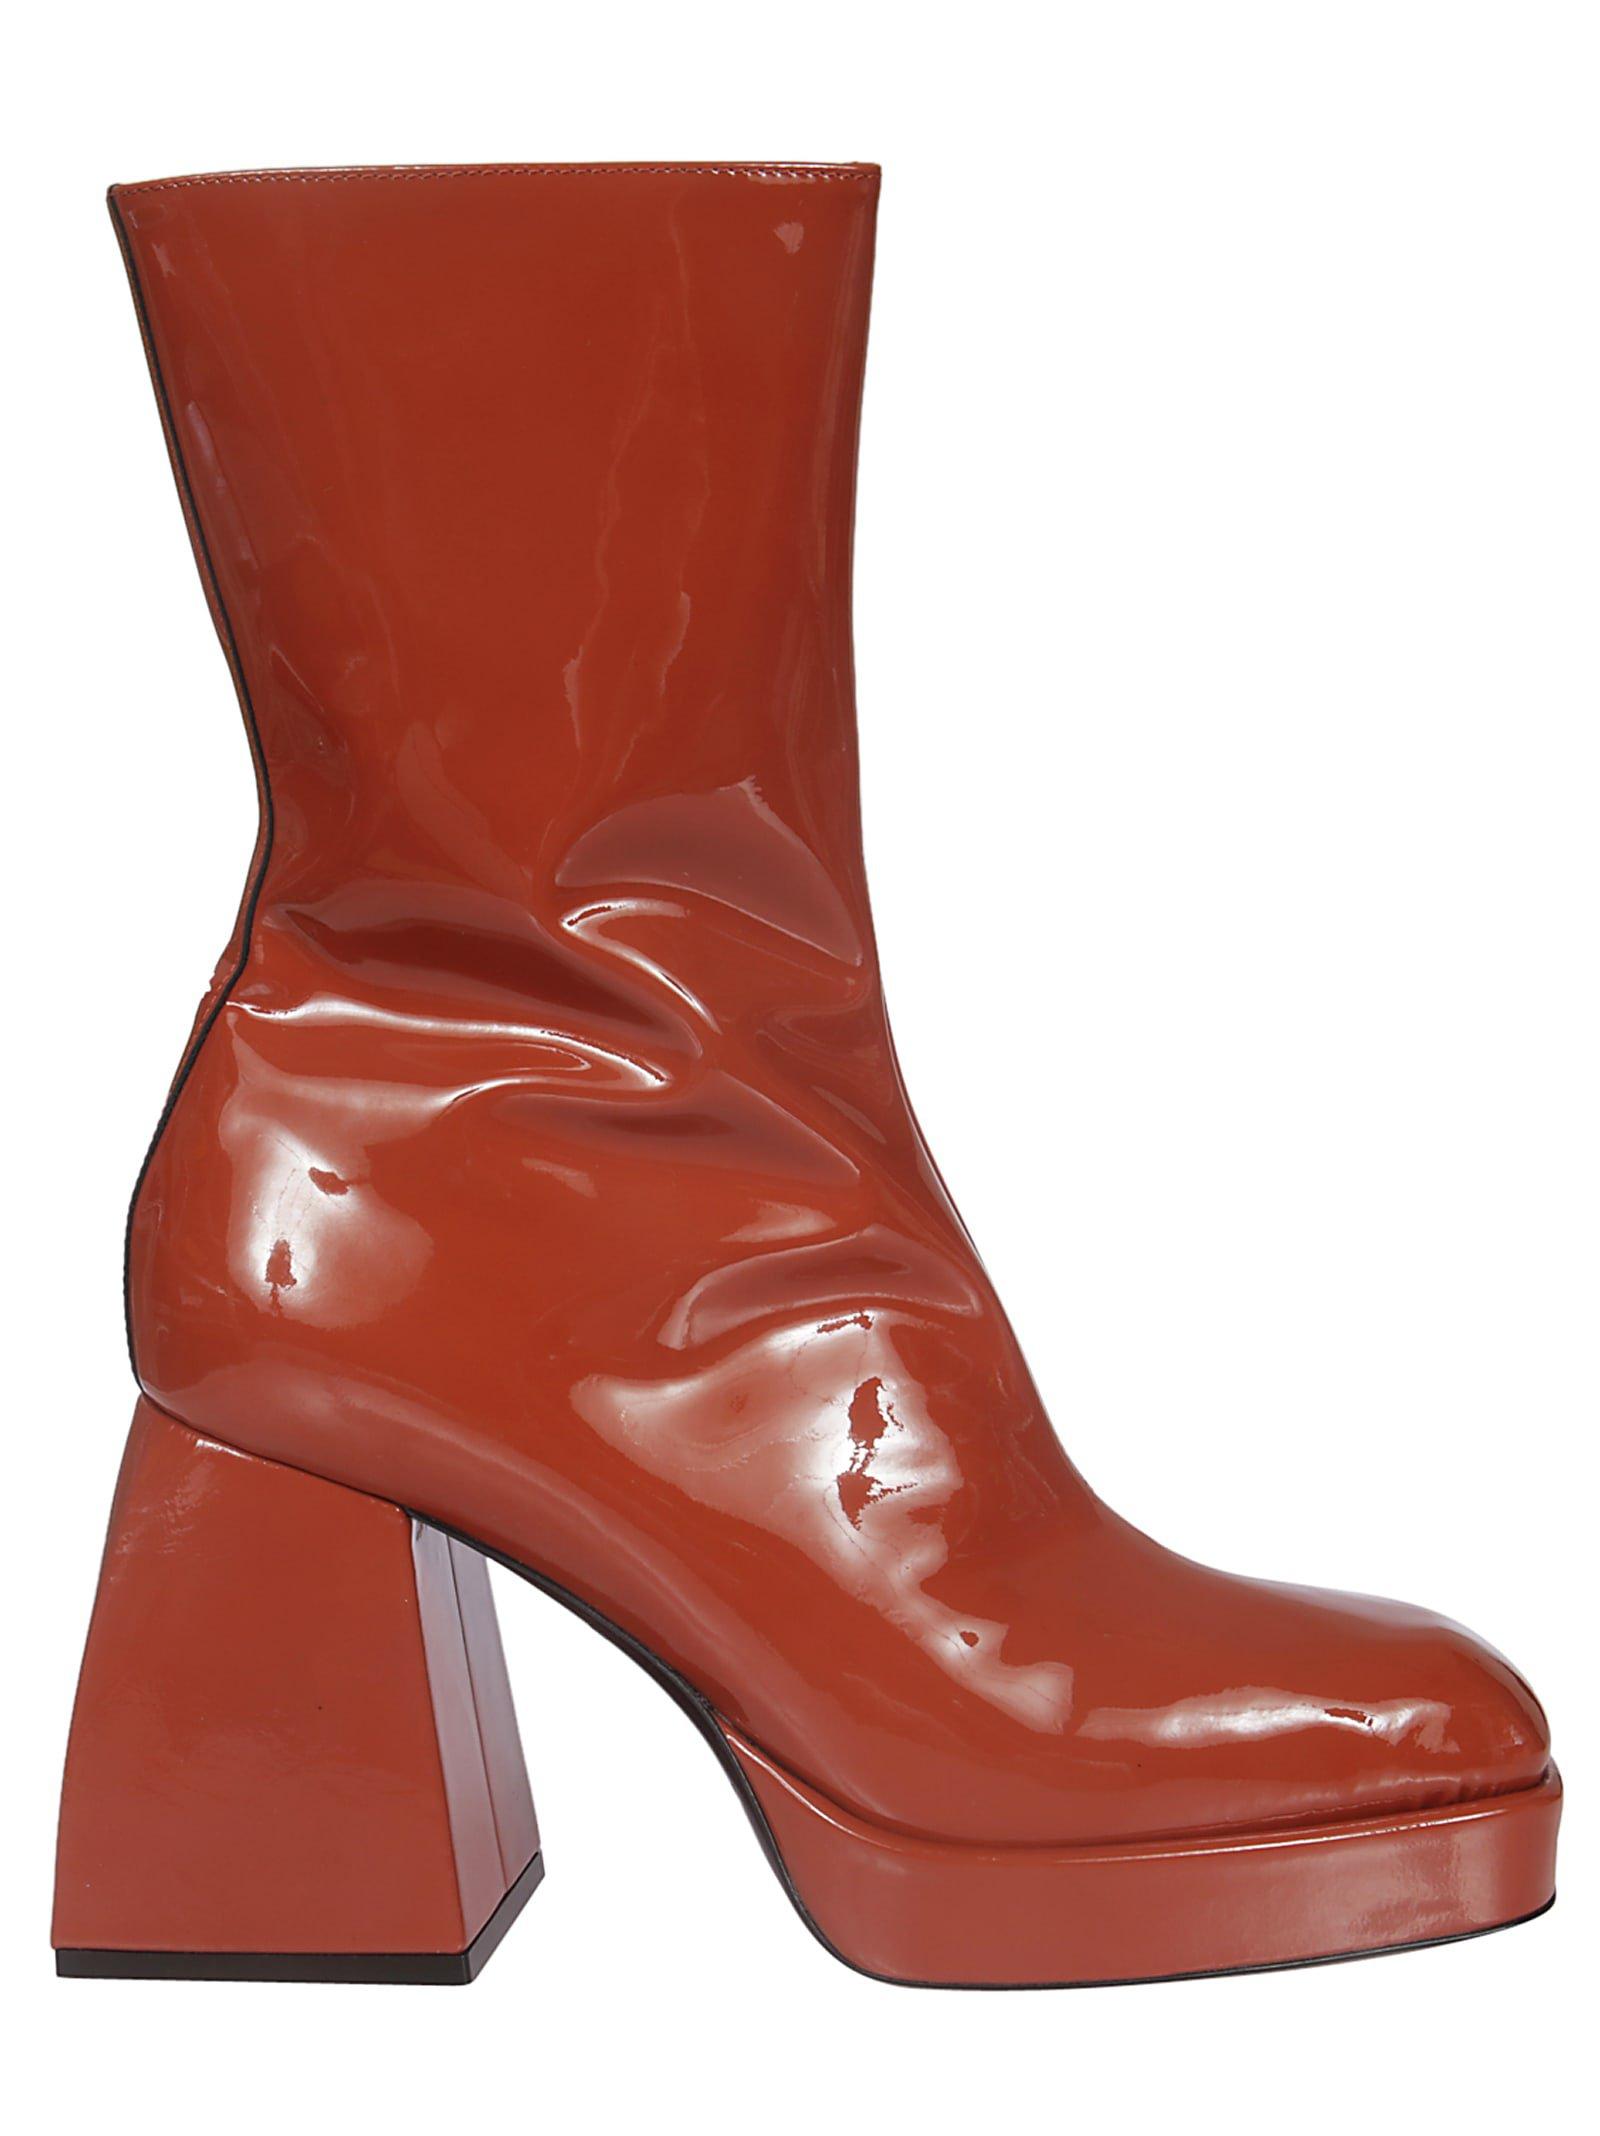 Nodaleto Corta Block Heel Zipped Boots